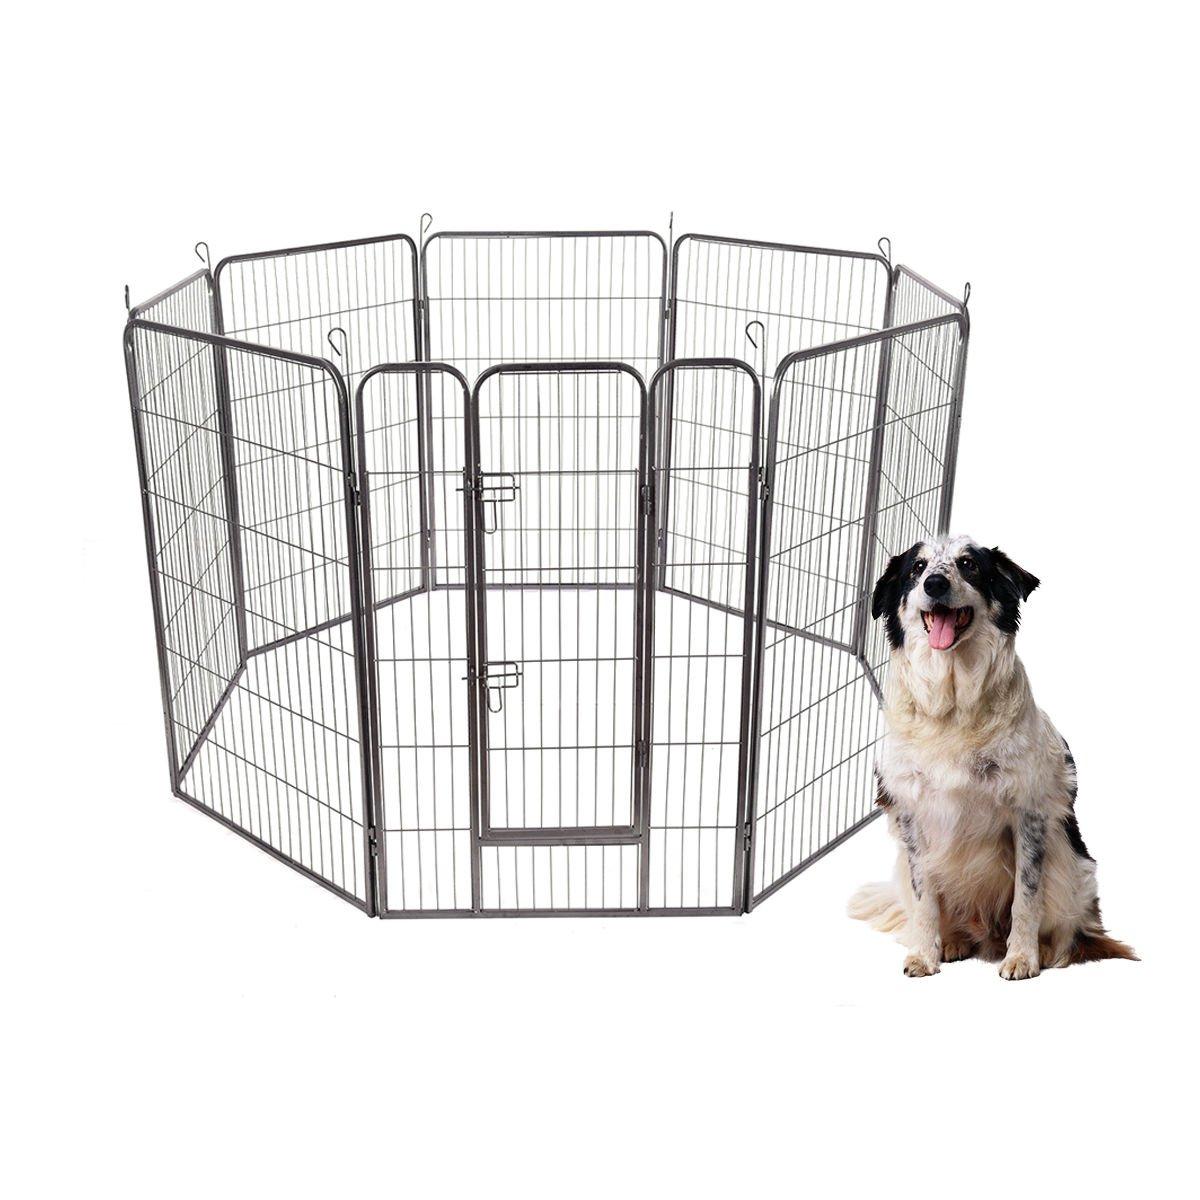 S AFSTAR Safstar 48''/40''/32''/24'' High 8 Panels Pet Playpen Dog Pets Fence Exercise Pen Gate with Door (24 Inch)